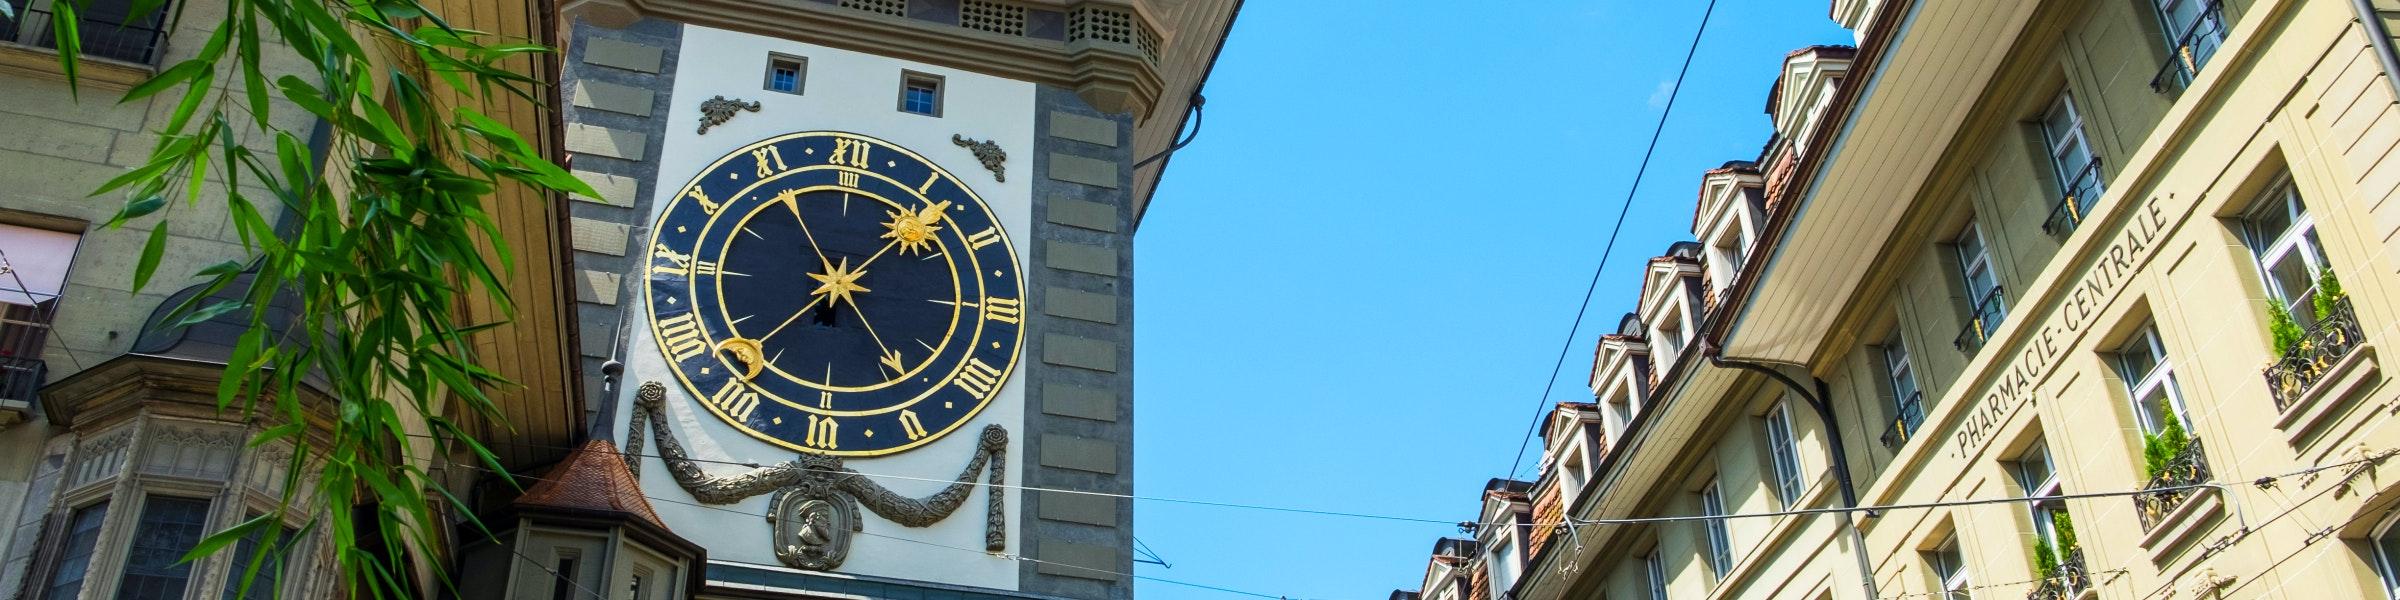 Clock tower Zytglogge Bern